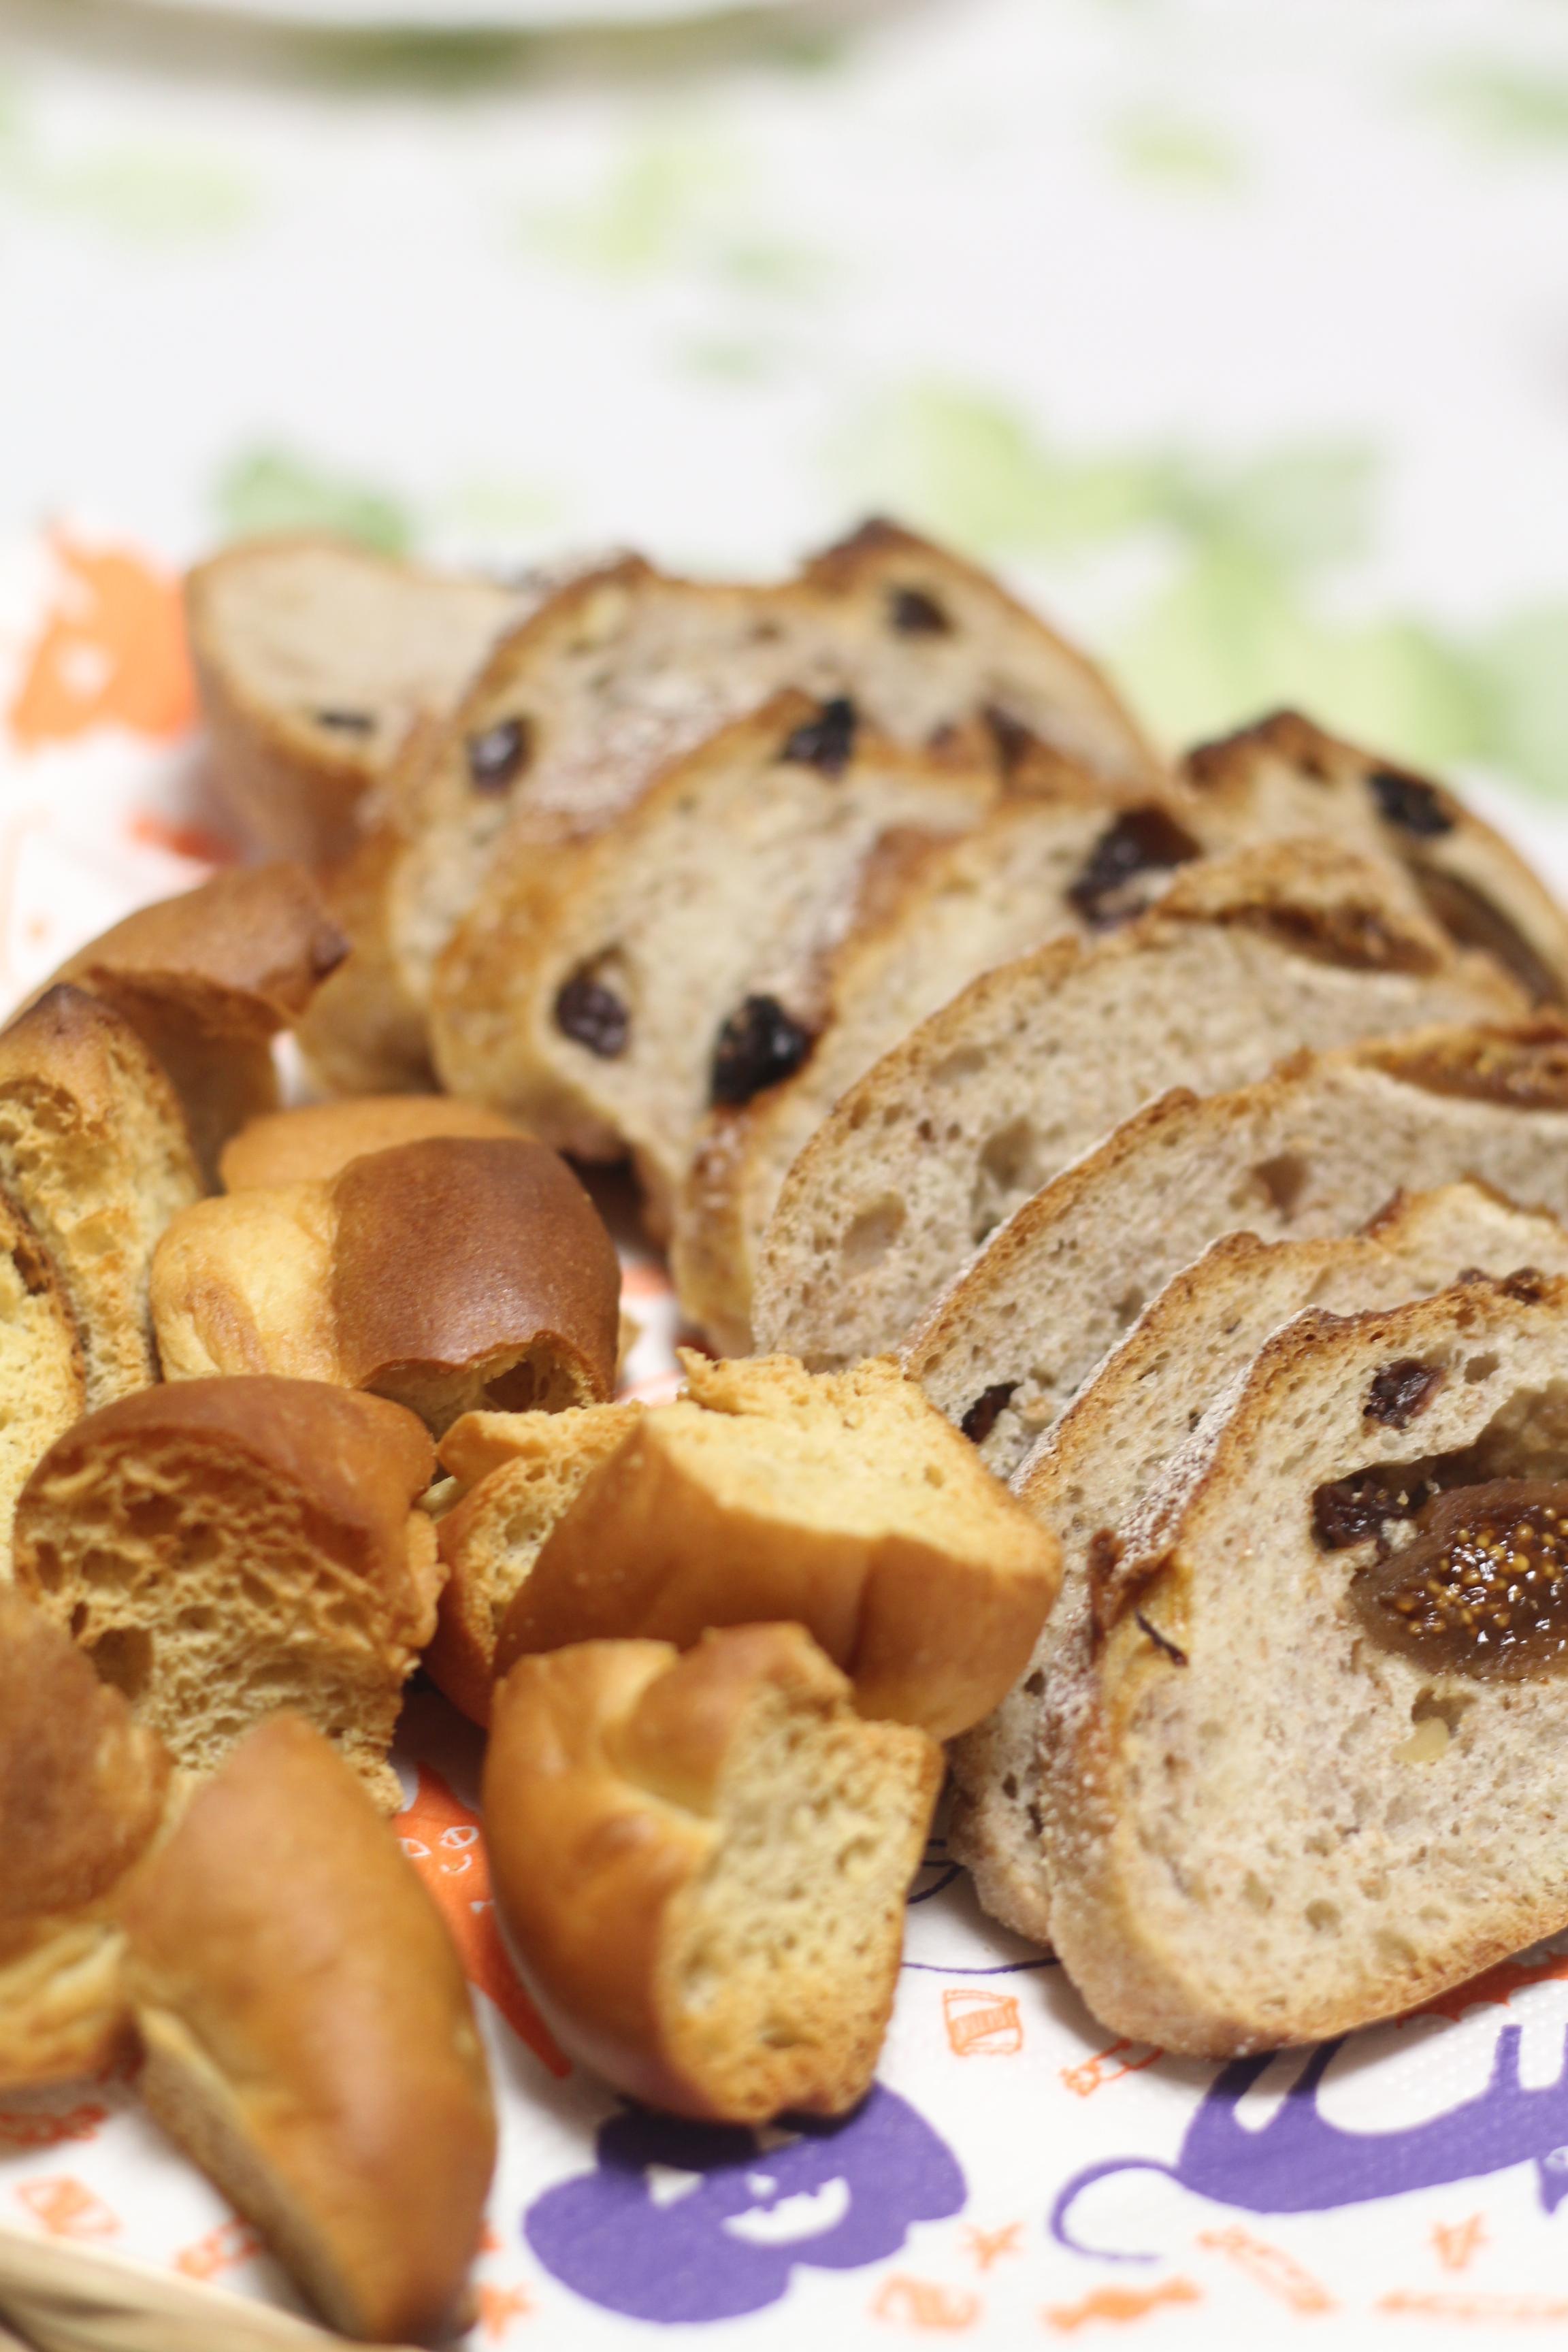 a-ta-sante糖質制限パン料理教室、阿倍野区西田辺。京都江部粉糖質制限パン教室。シルバーウィークのお料理。